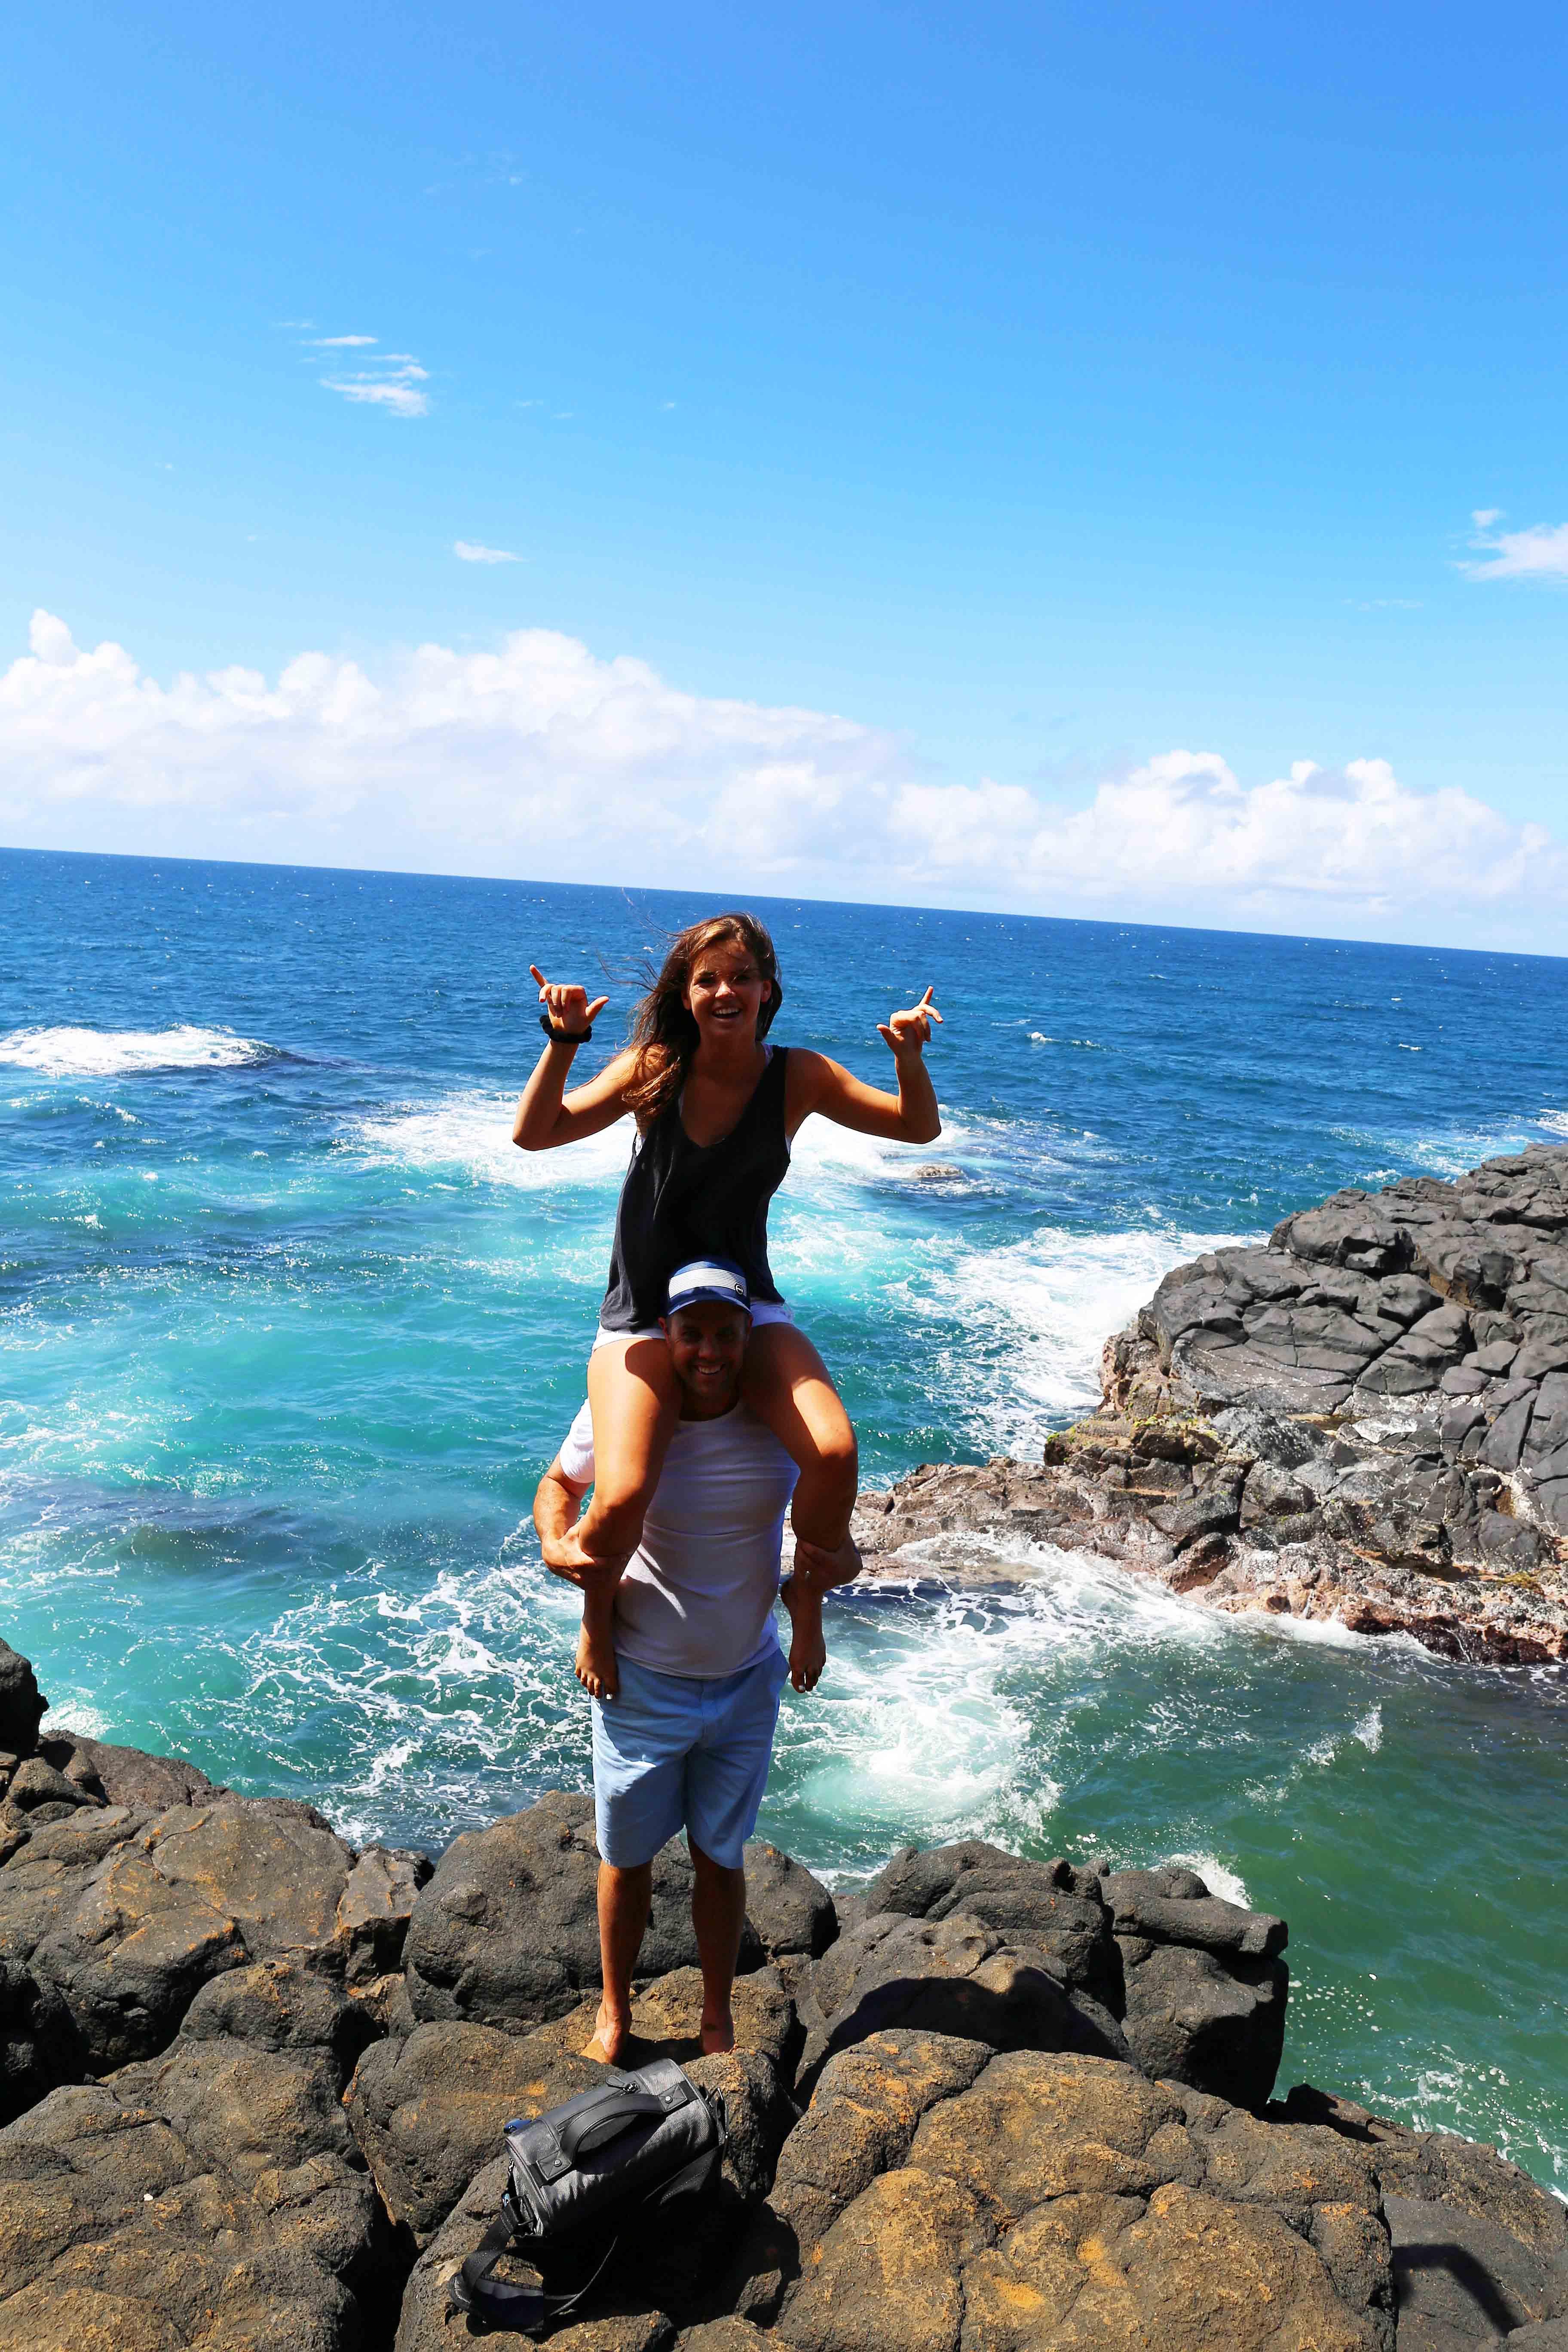 Kauai guide map | franko's fabulous maps of favorite places.